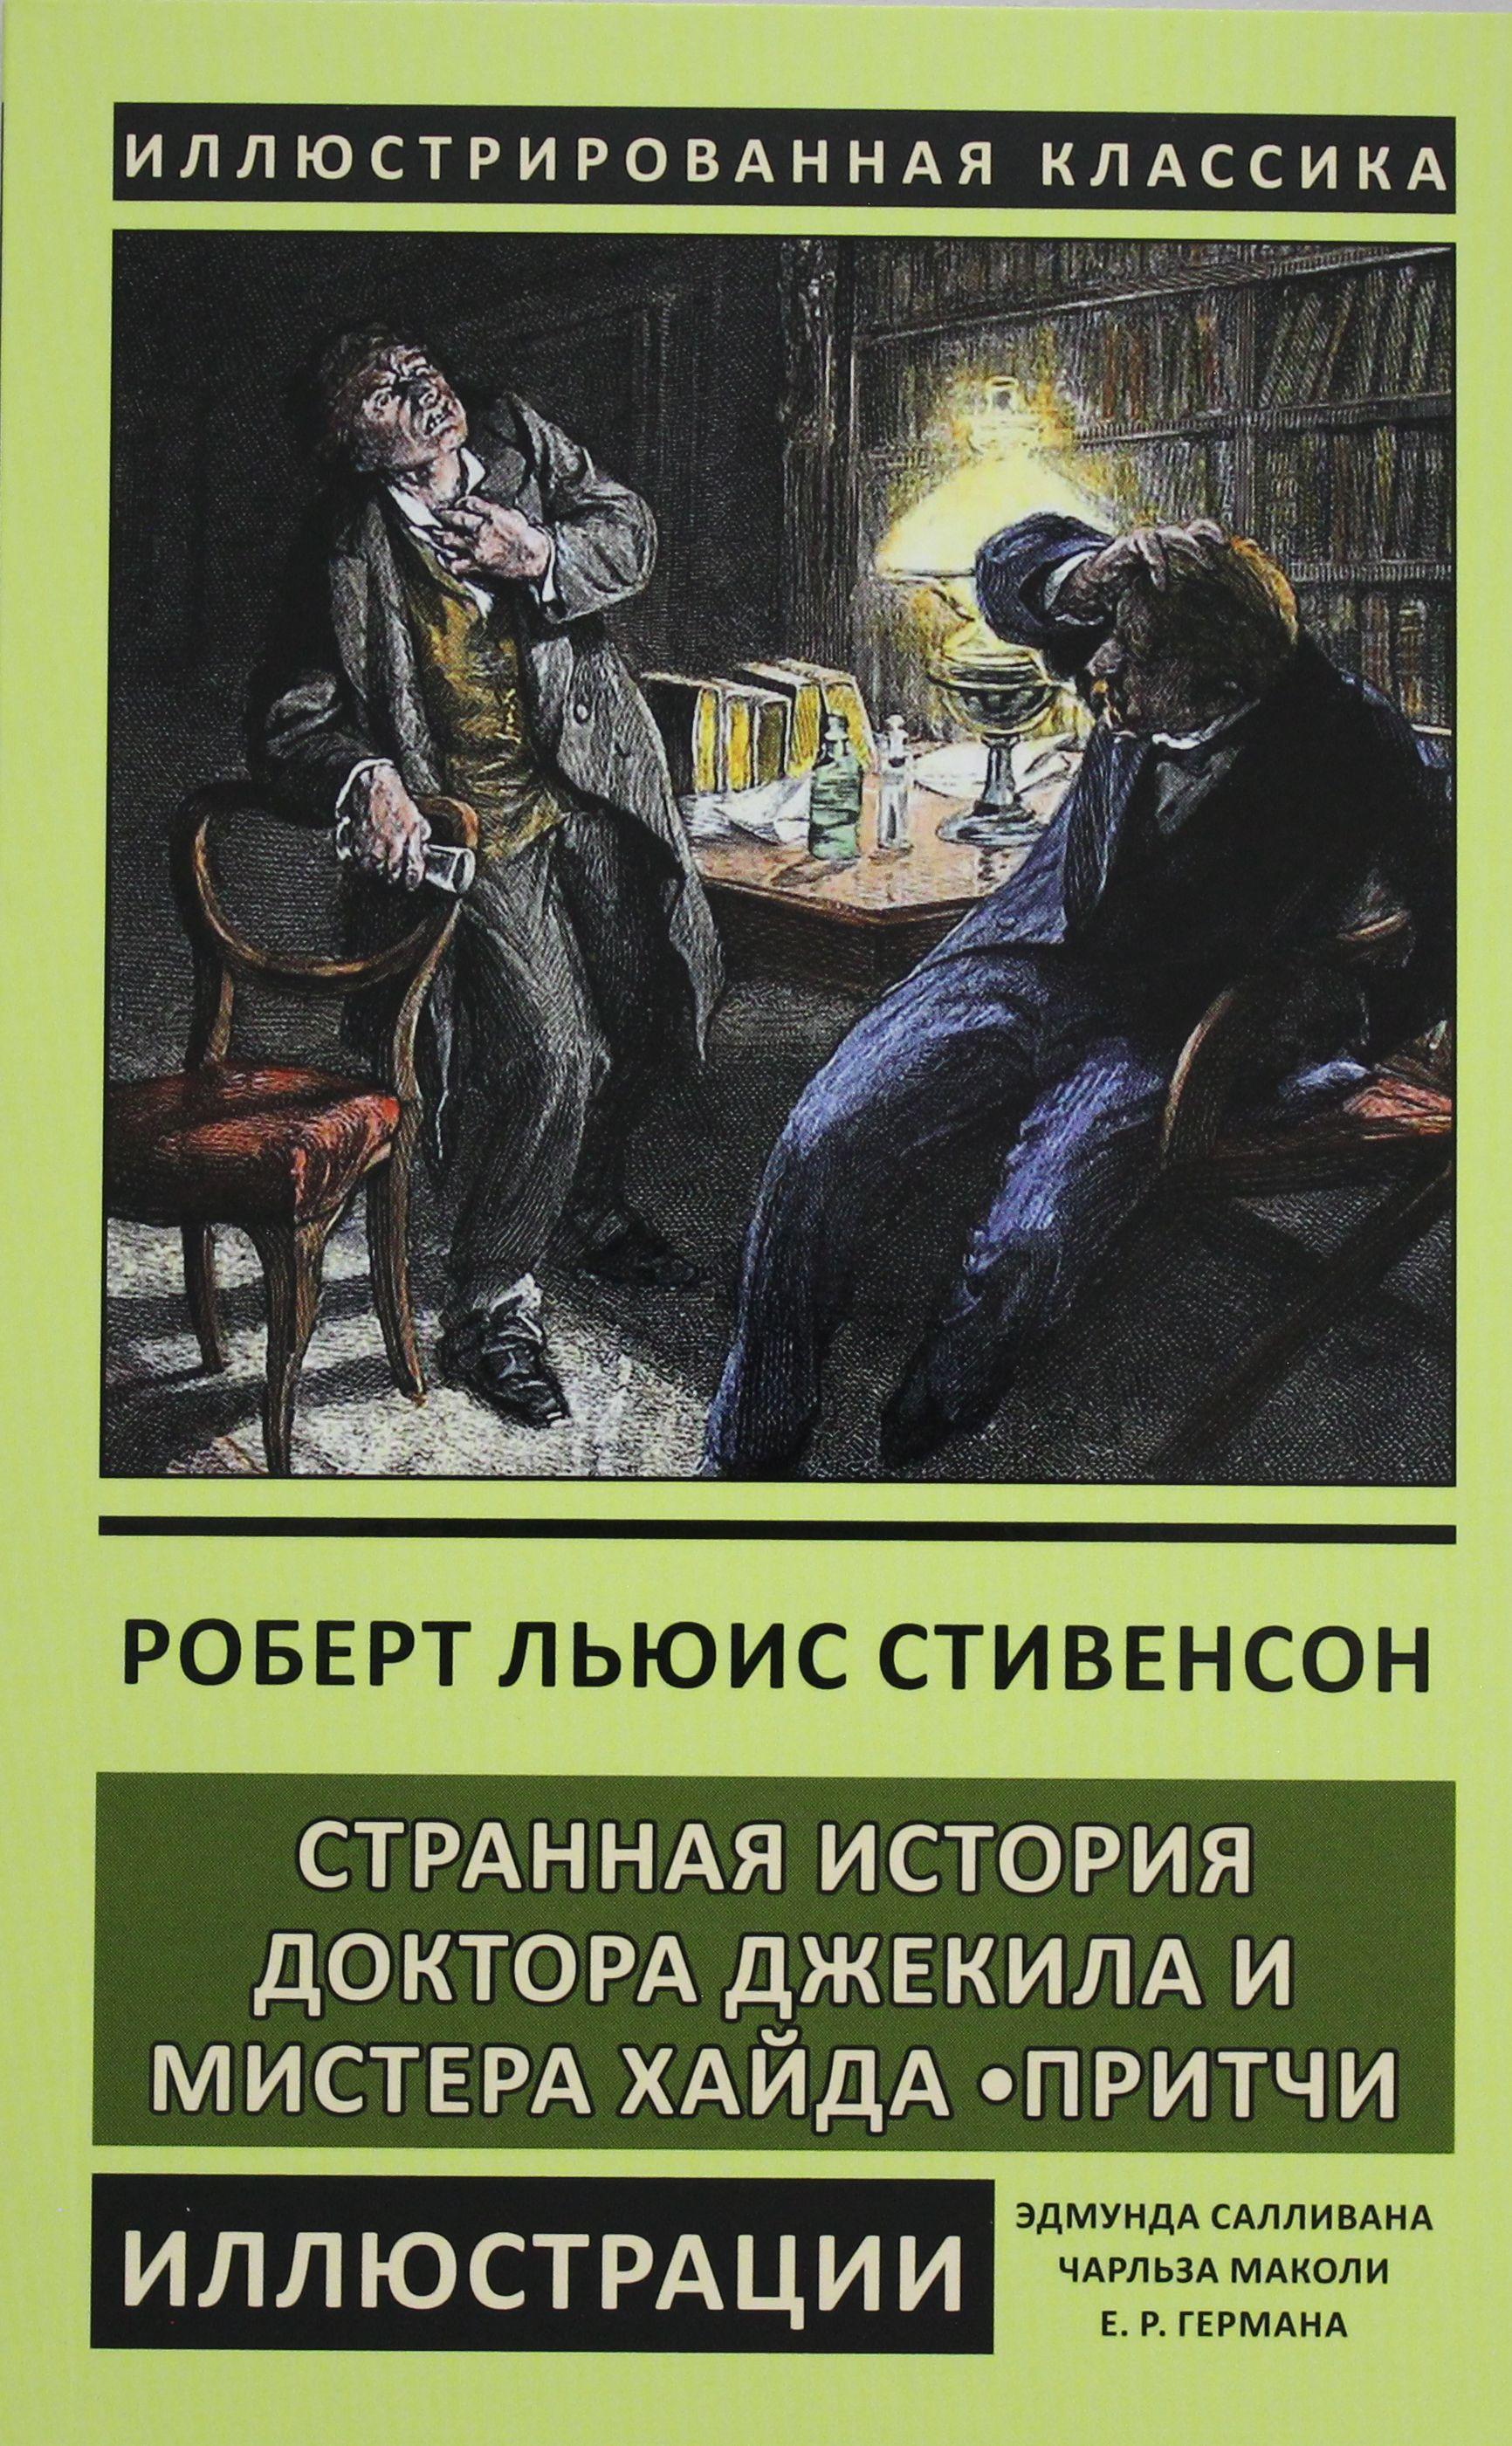 Strannaja istorija doktora Dzhekila i mistera Khajda. Pritchi.